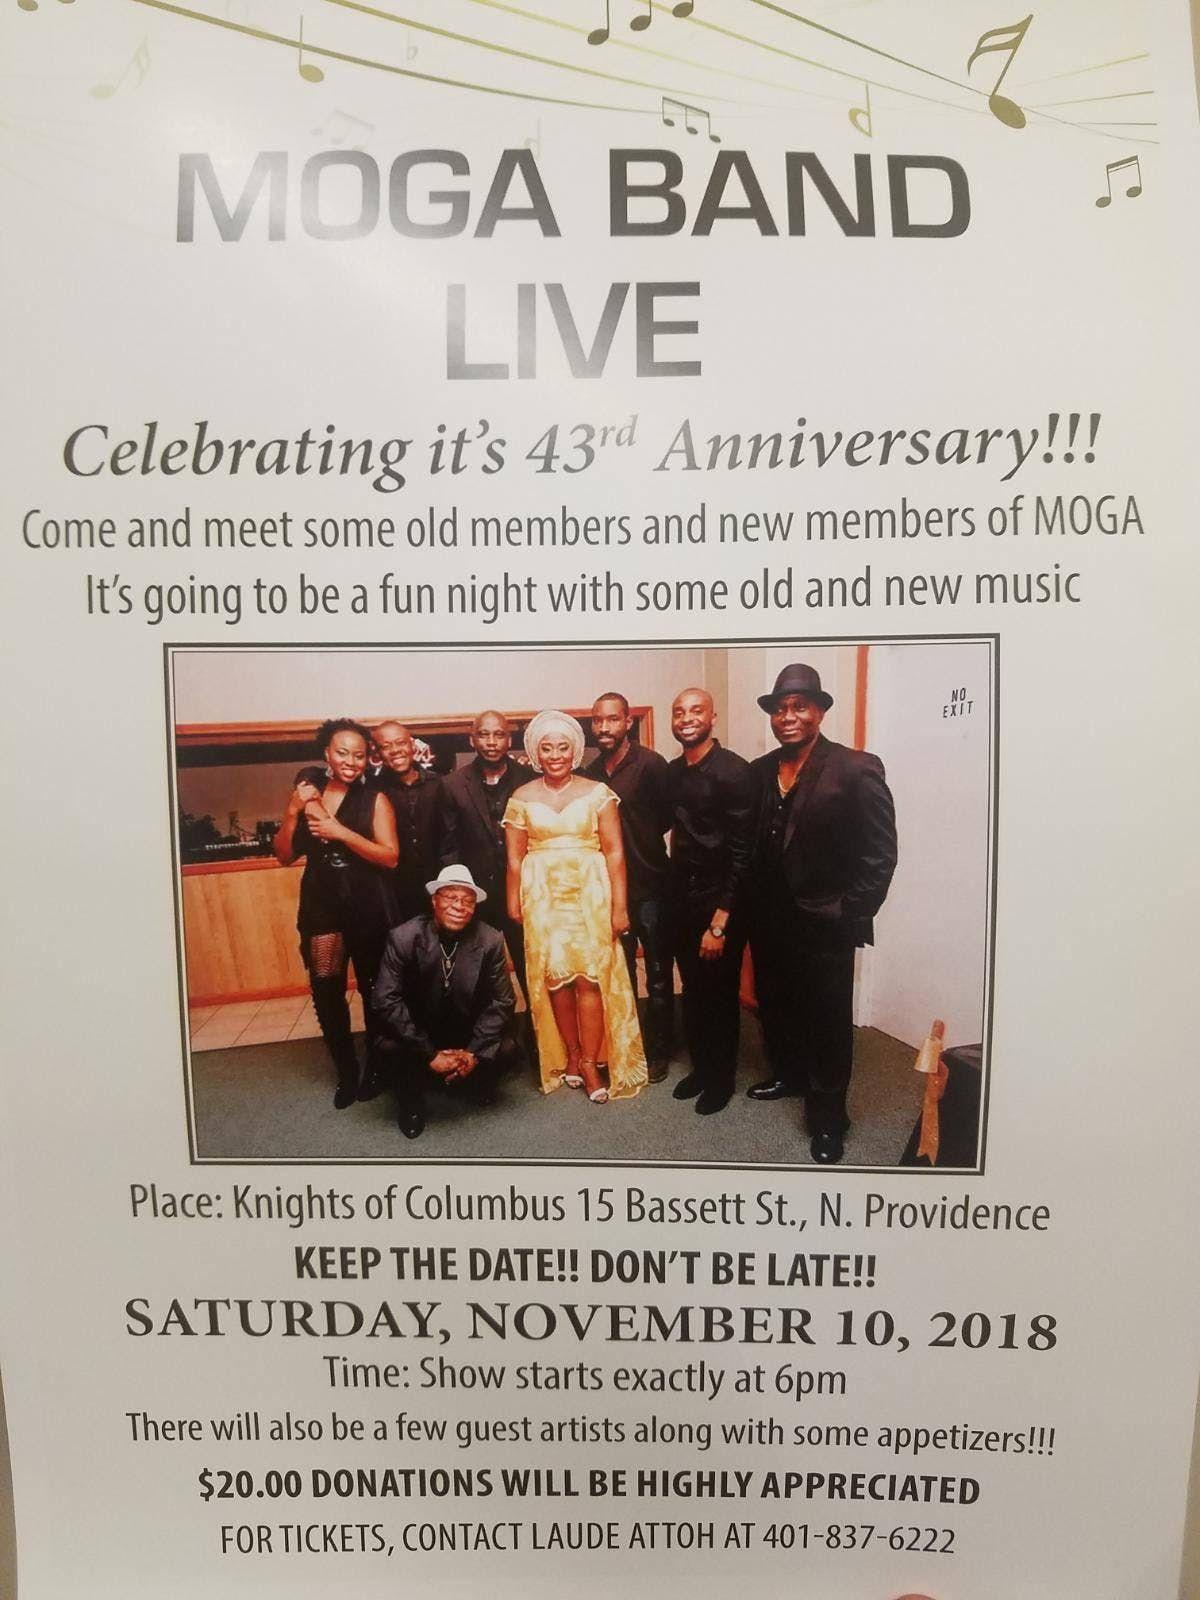 MOGA BAND LIVE 43rd Anniversary Concert